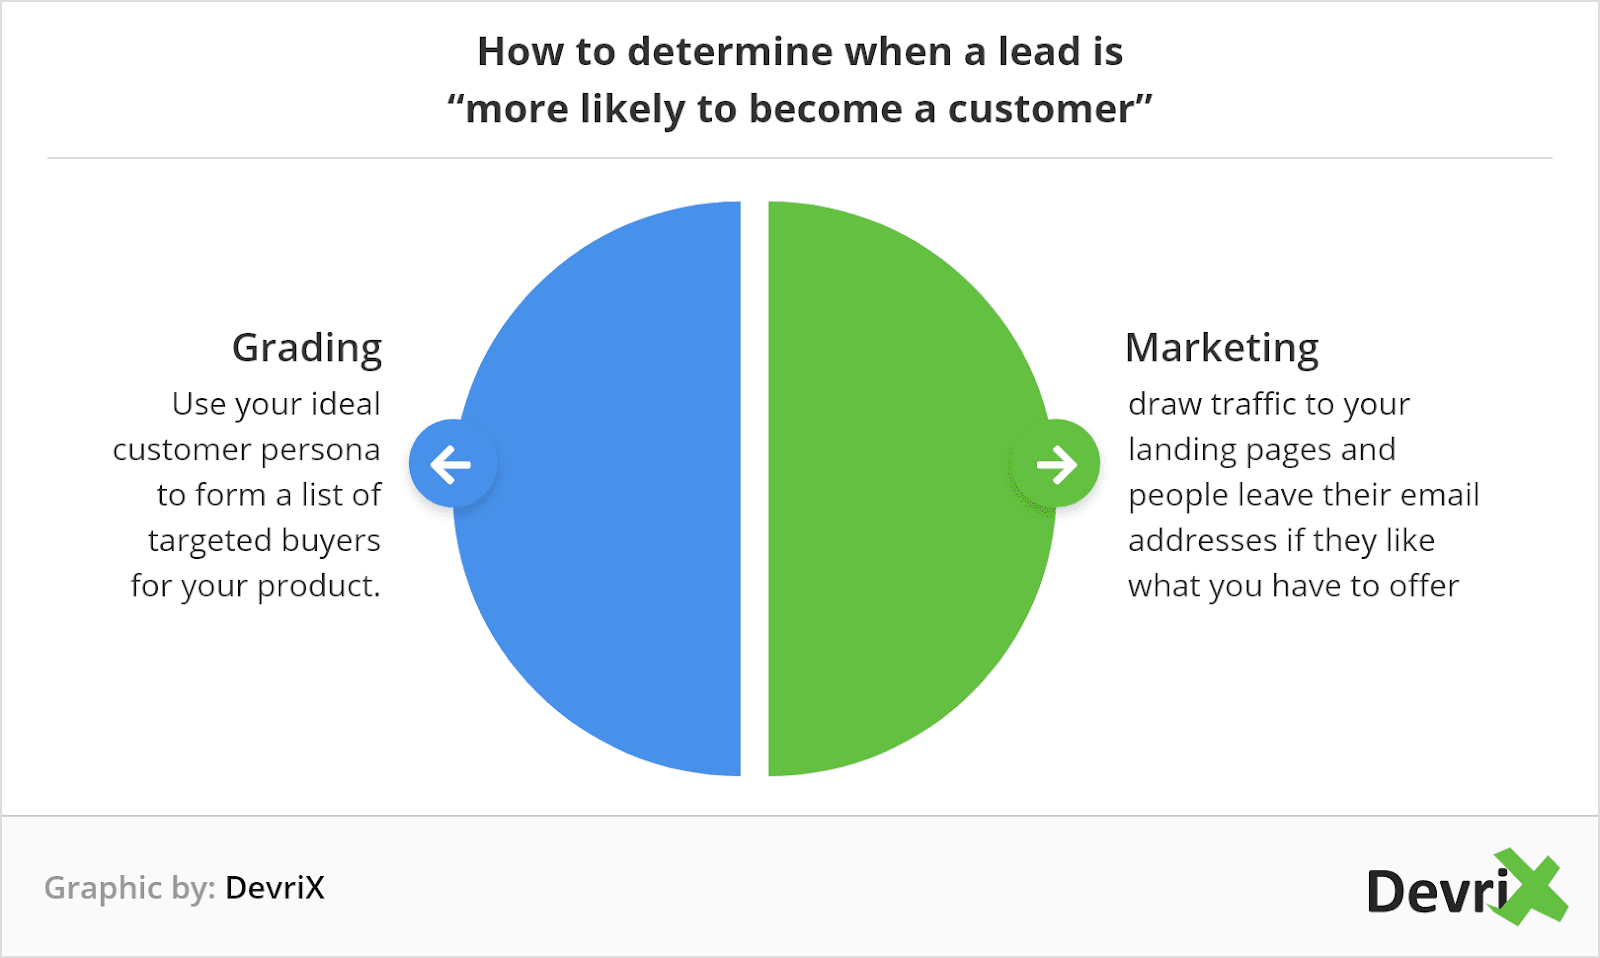 Grading and Marketing